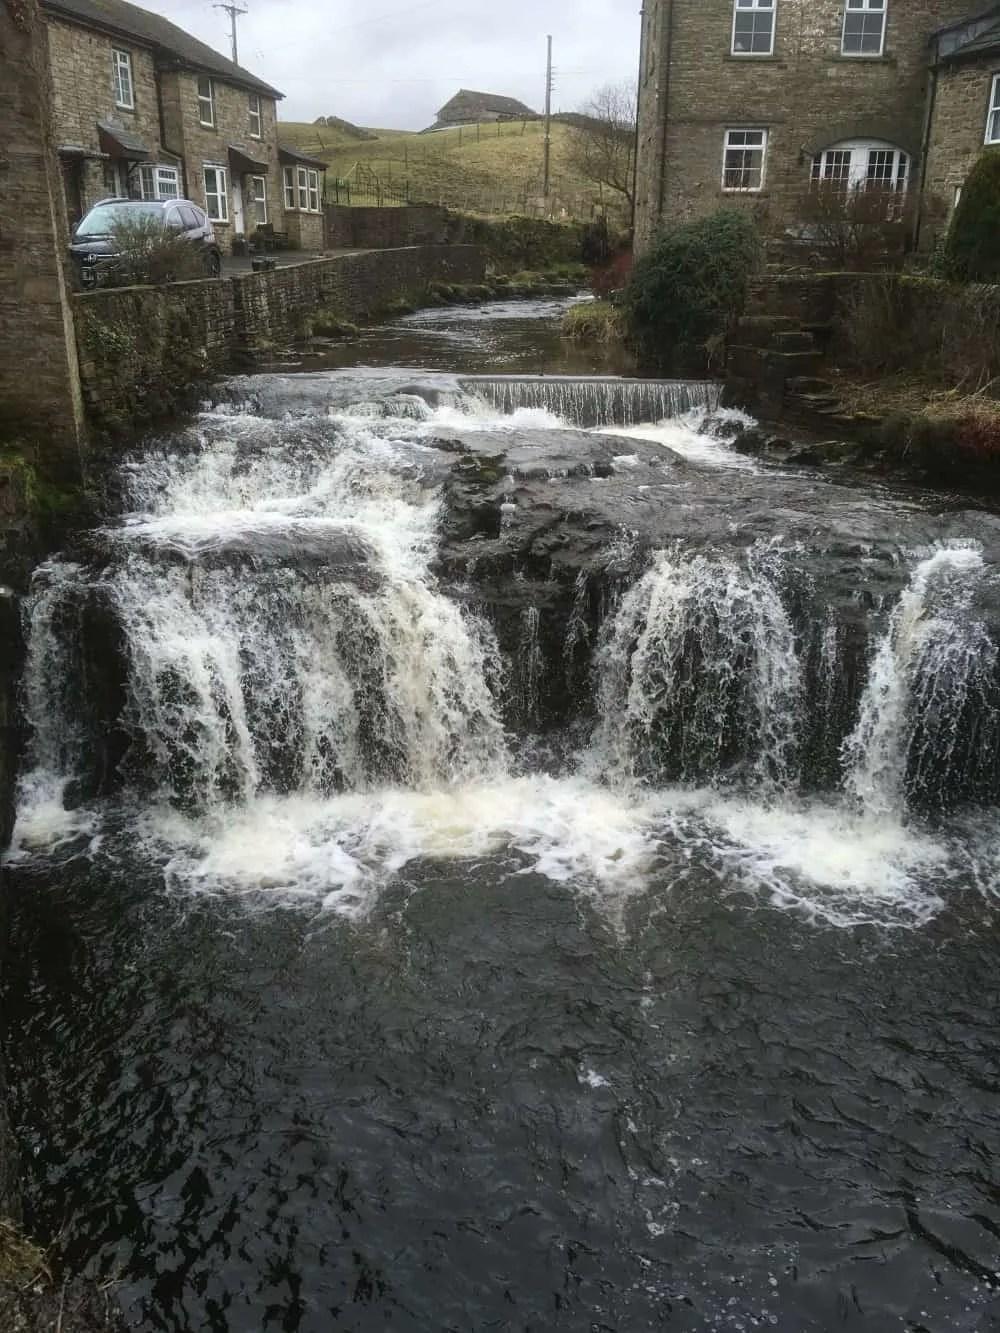 yorkshire-dales-delight, Raising Badgers